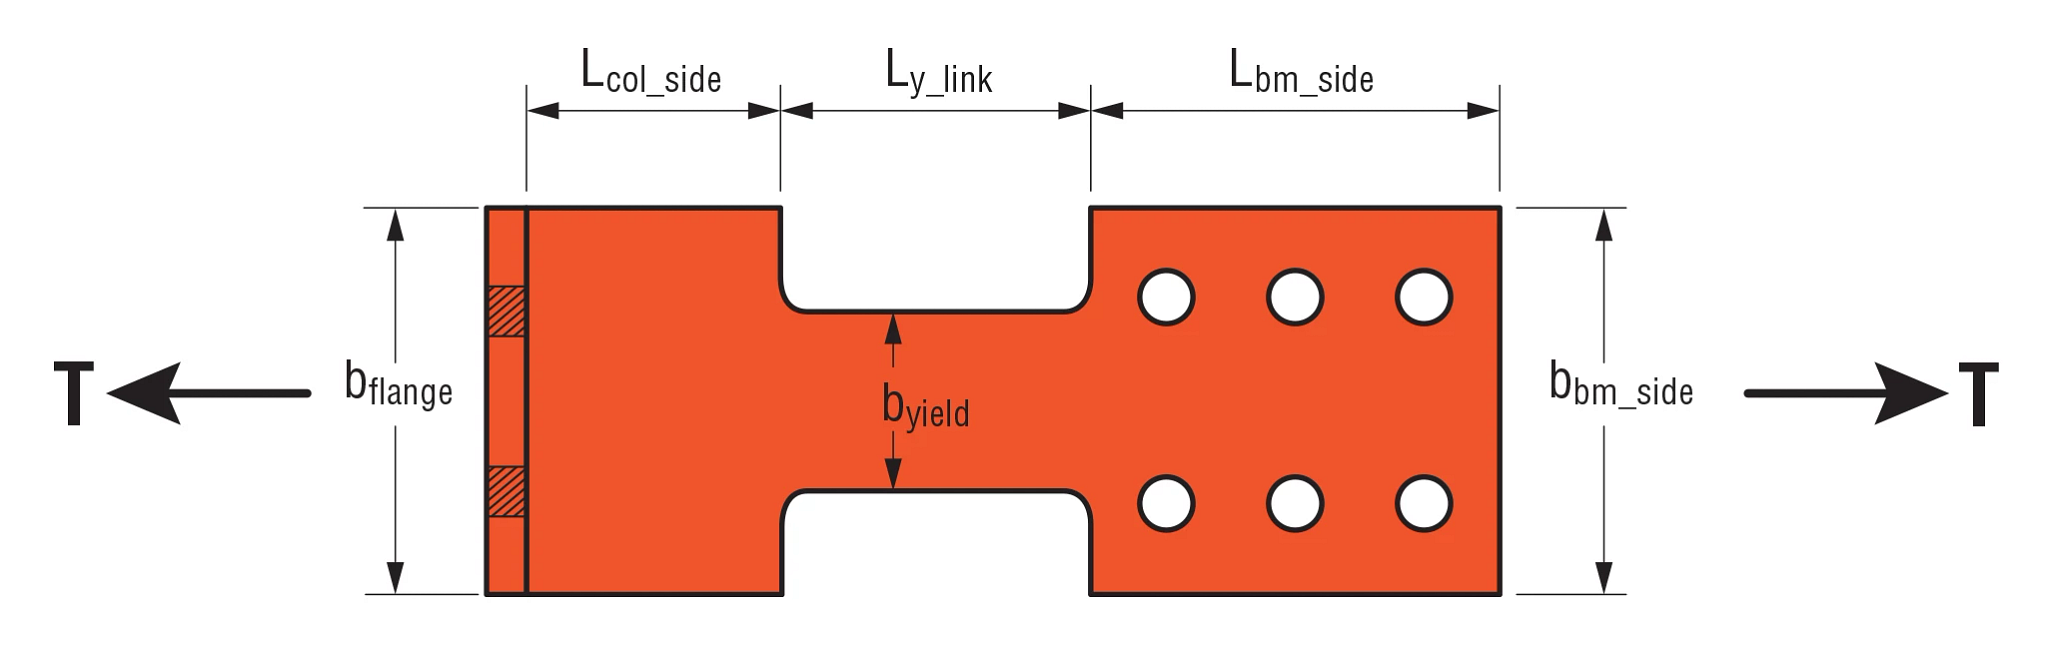 SMF Connection Design, Figure 1(a) - Design Parameters